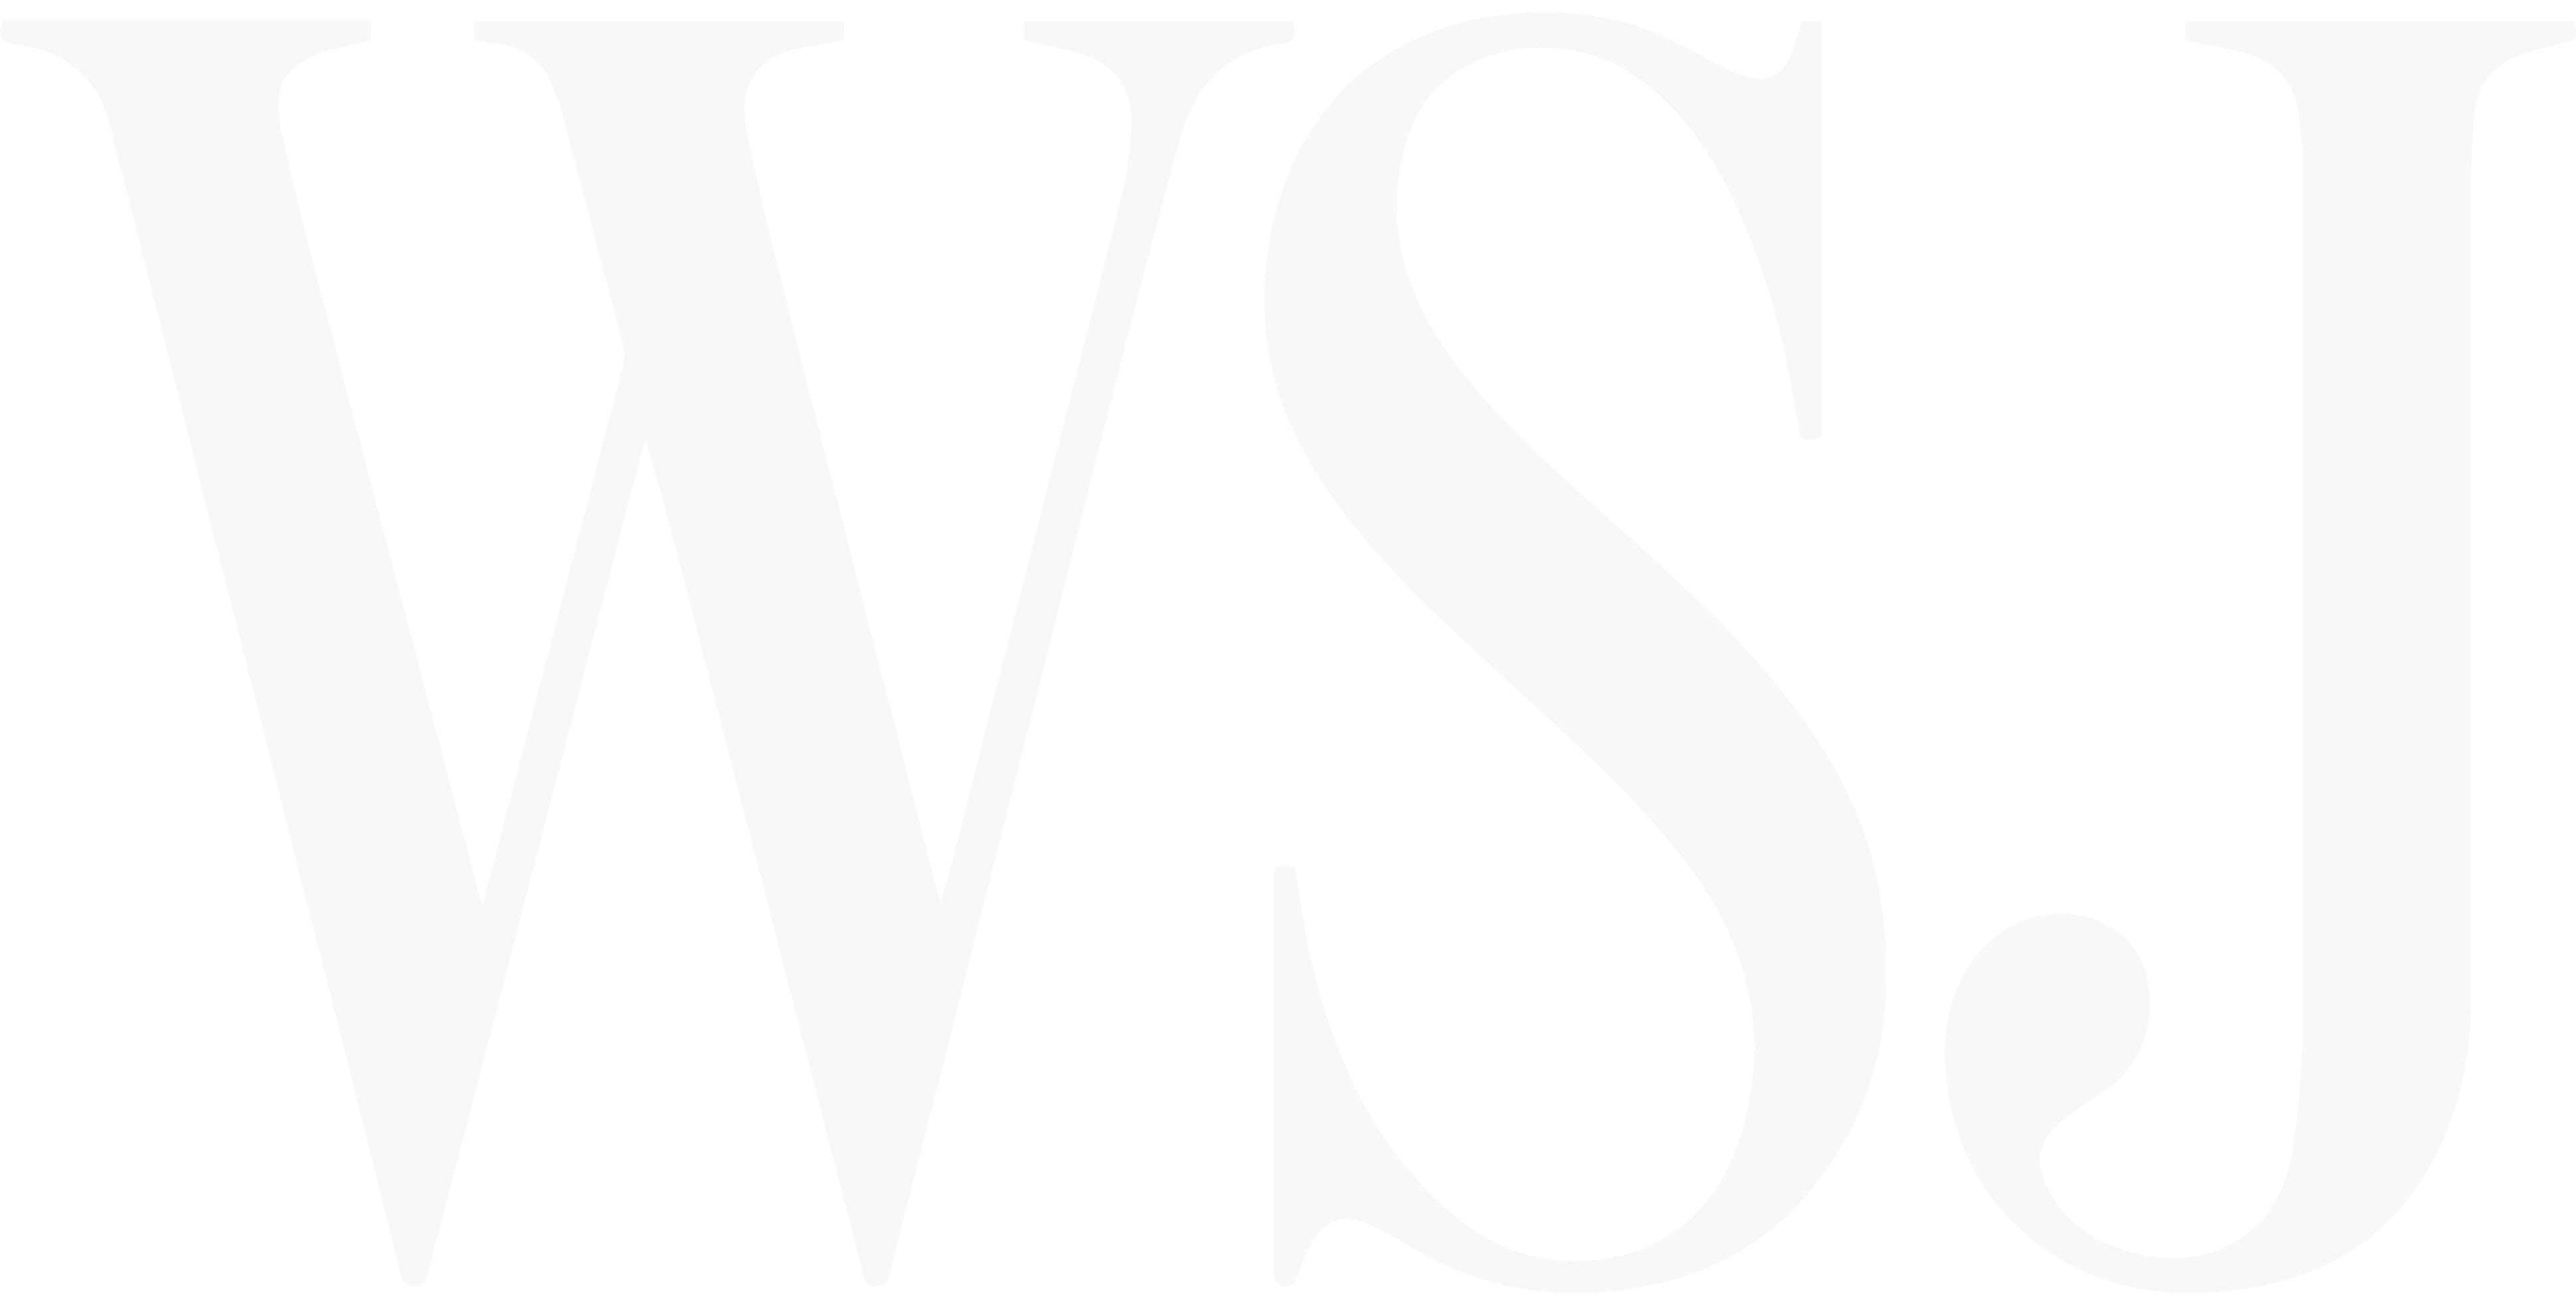 "A Washington Street Journal that says ""WSJ""."